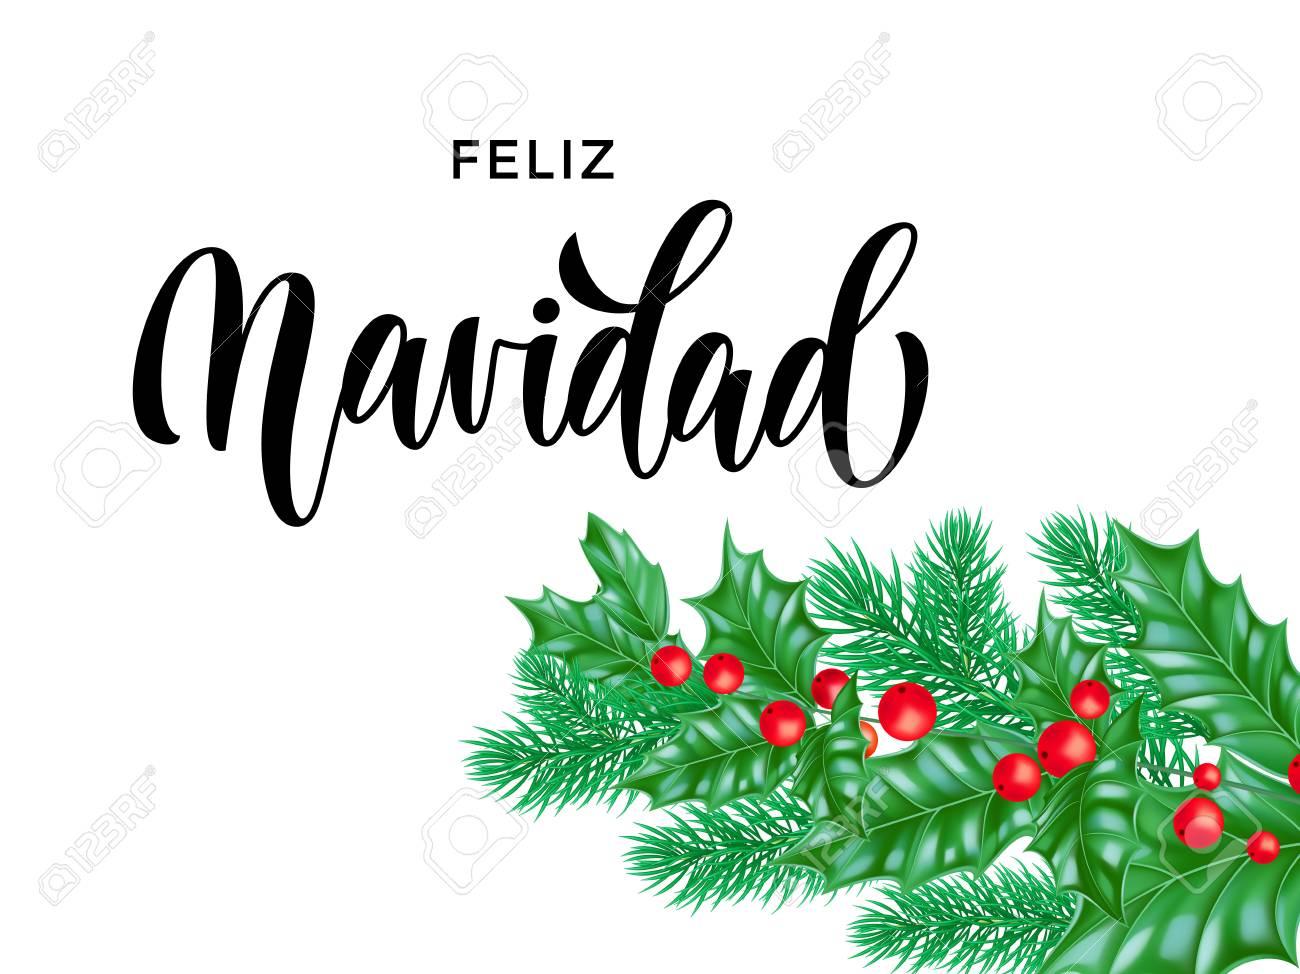 Feliz Navidad Spanish Merry Christmas Calligraphy Font On White Premium Background For Winter Xmas Holiday Design